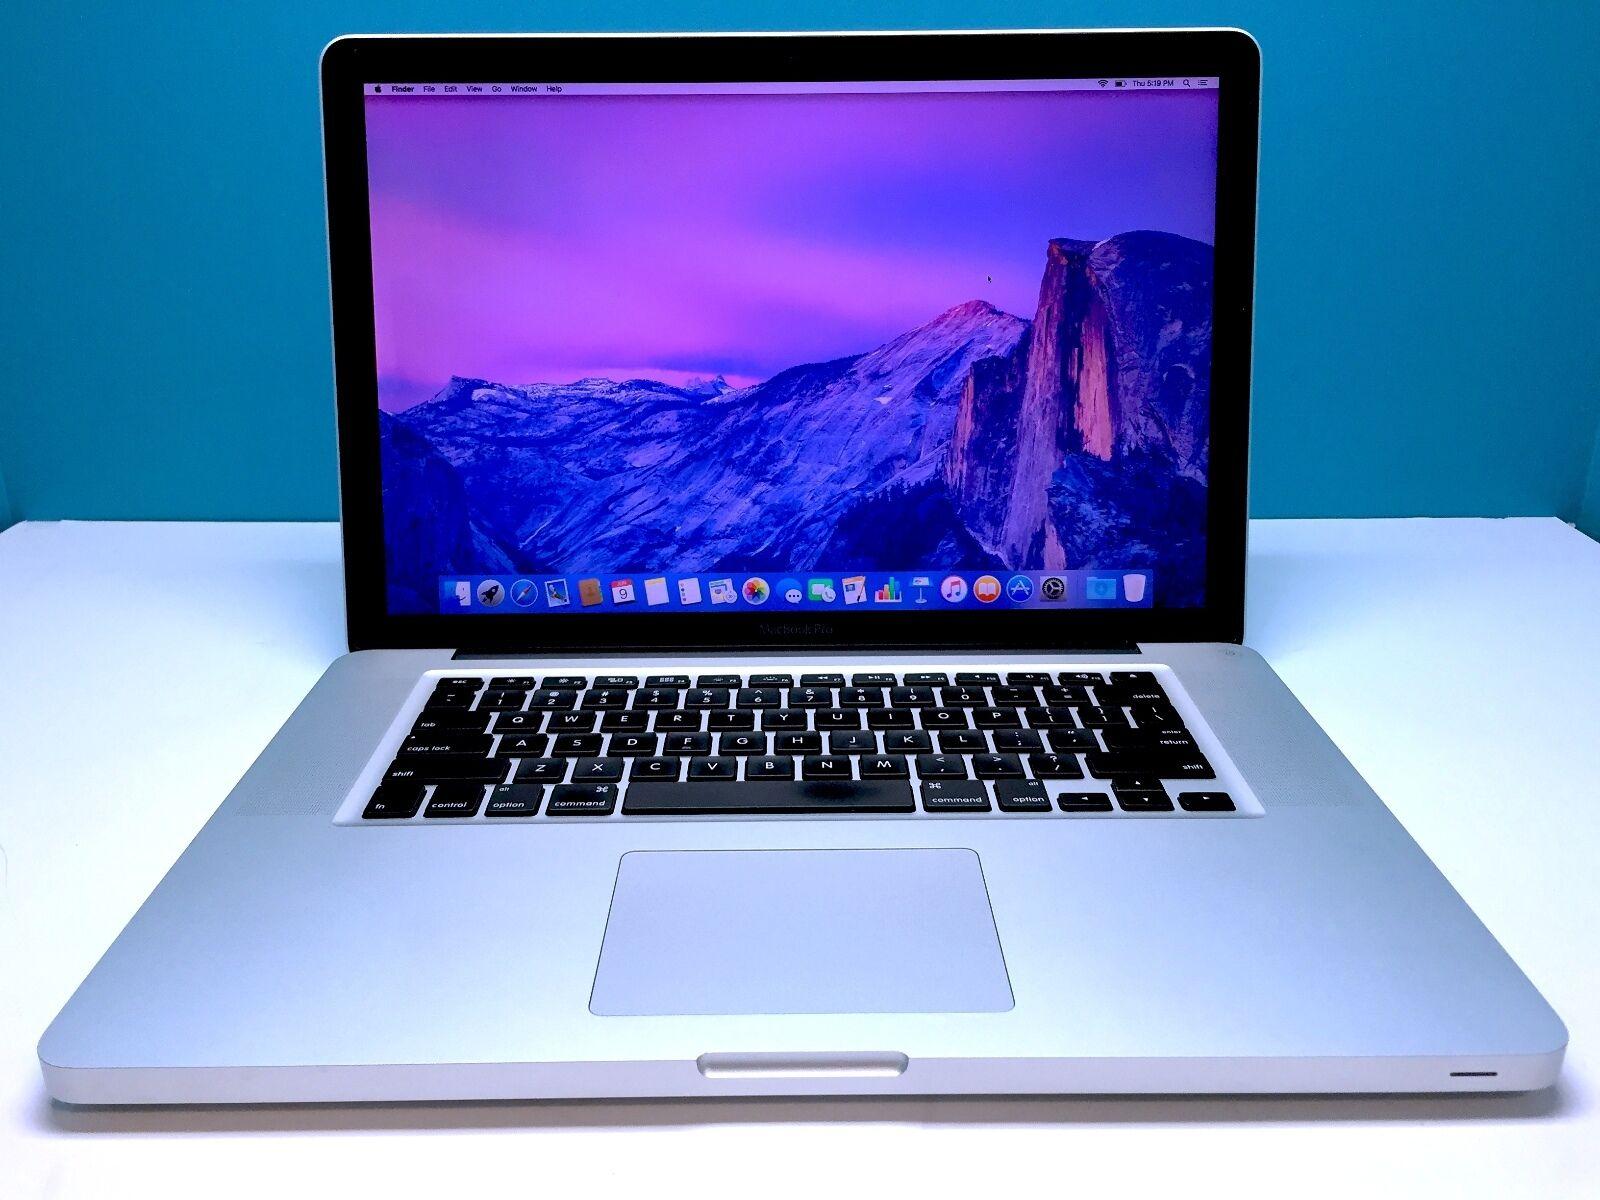 Macbook Pro Apple Laptop Core I5 2.4ghz 8gb 1tb